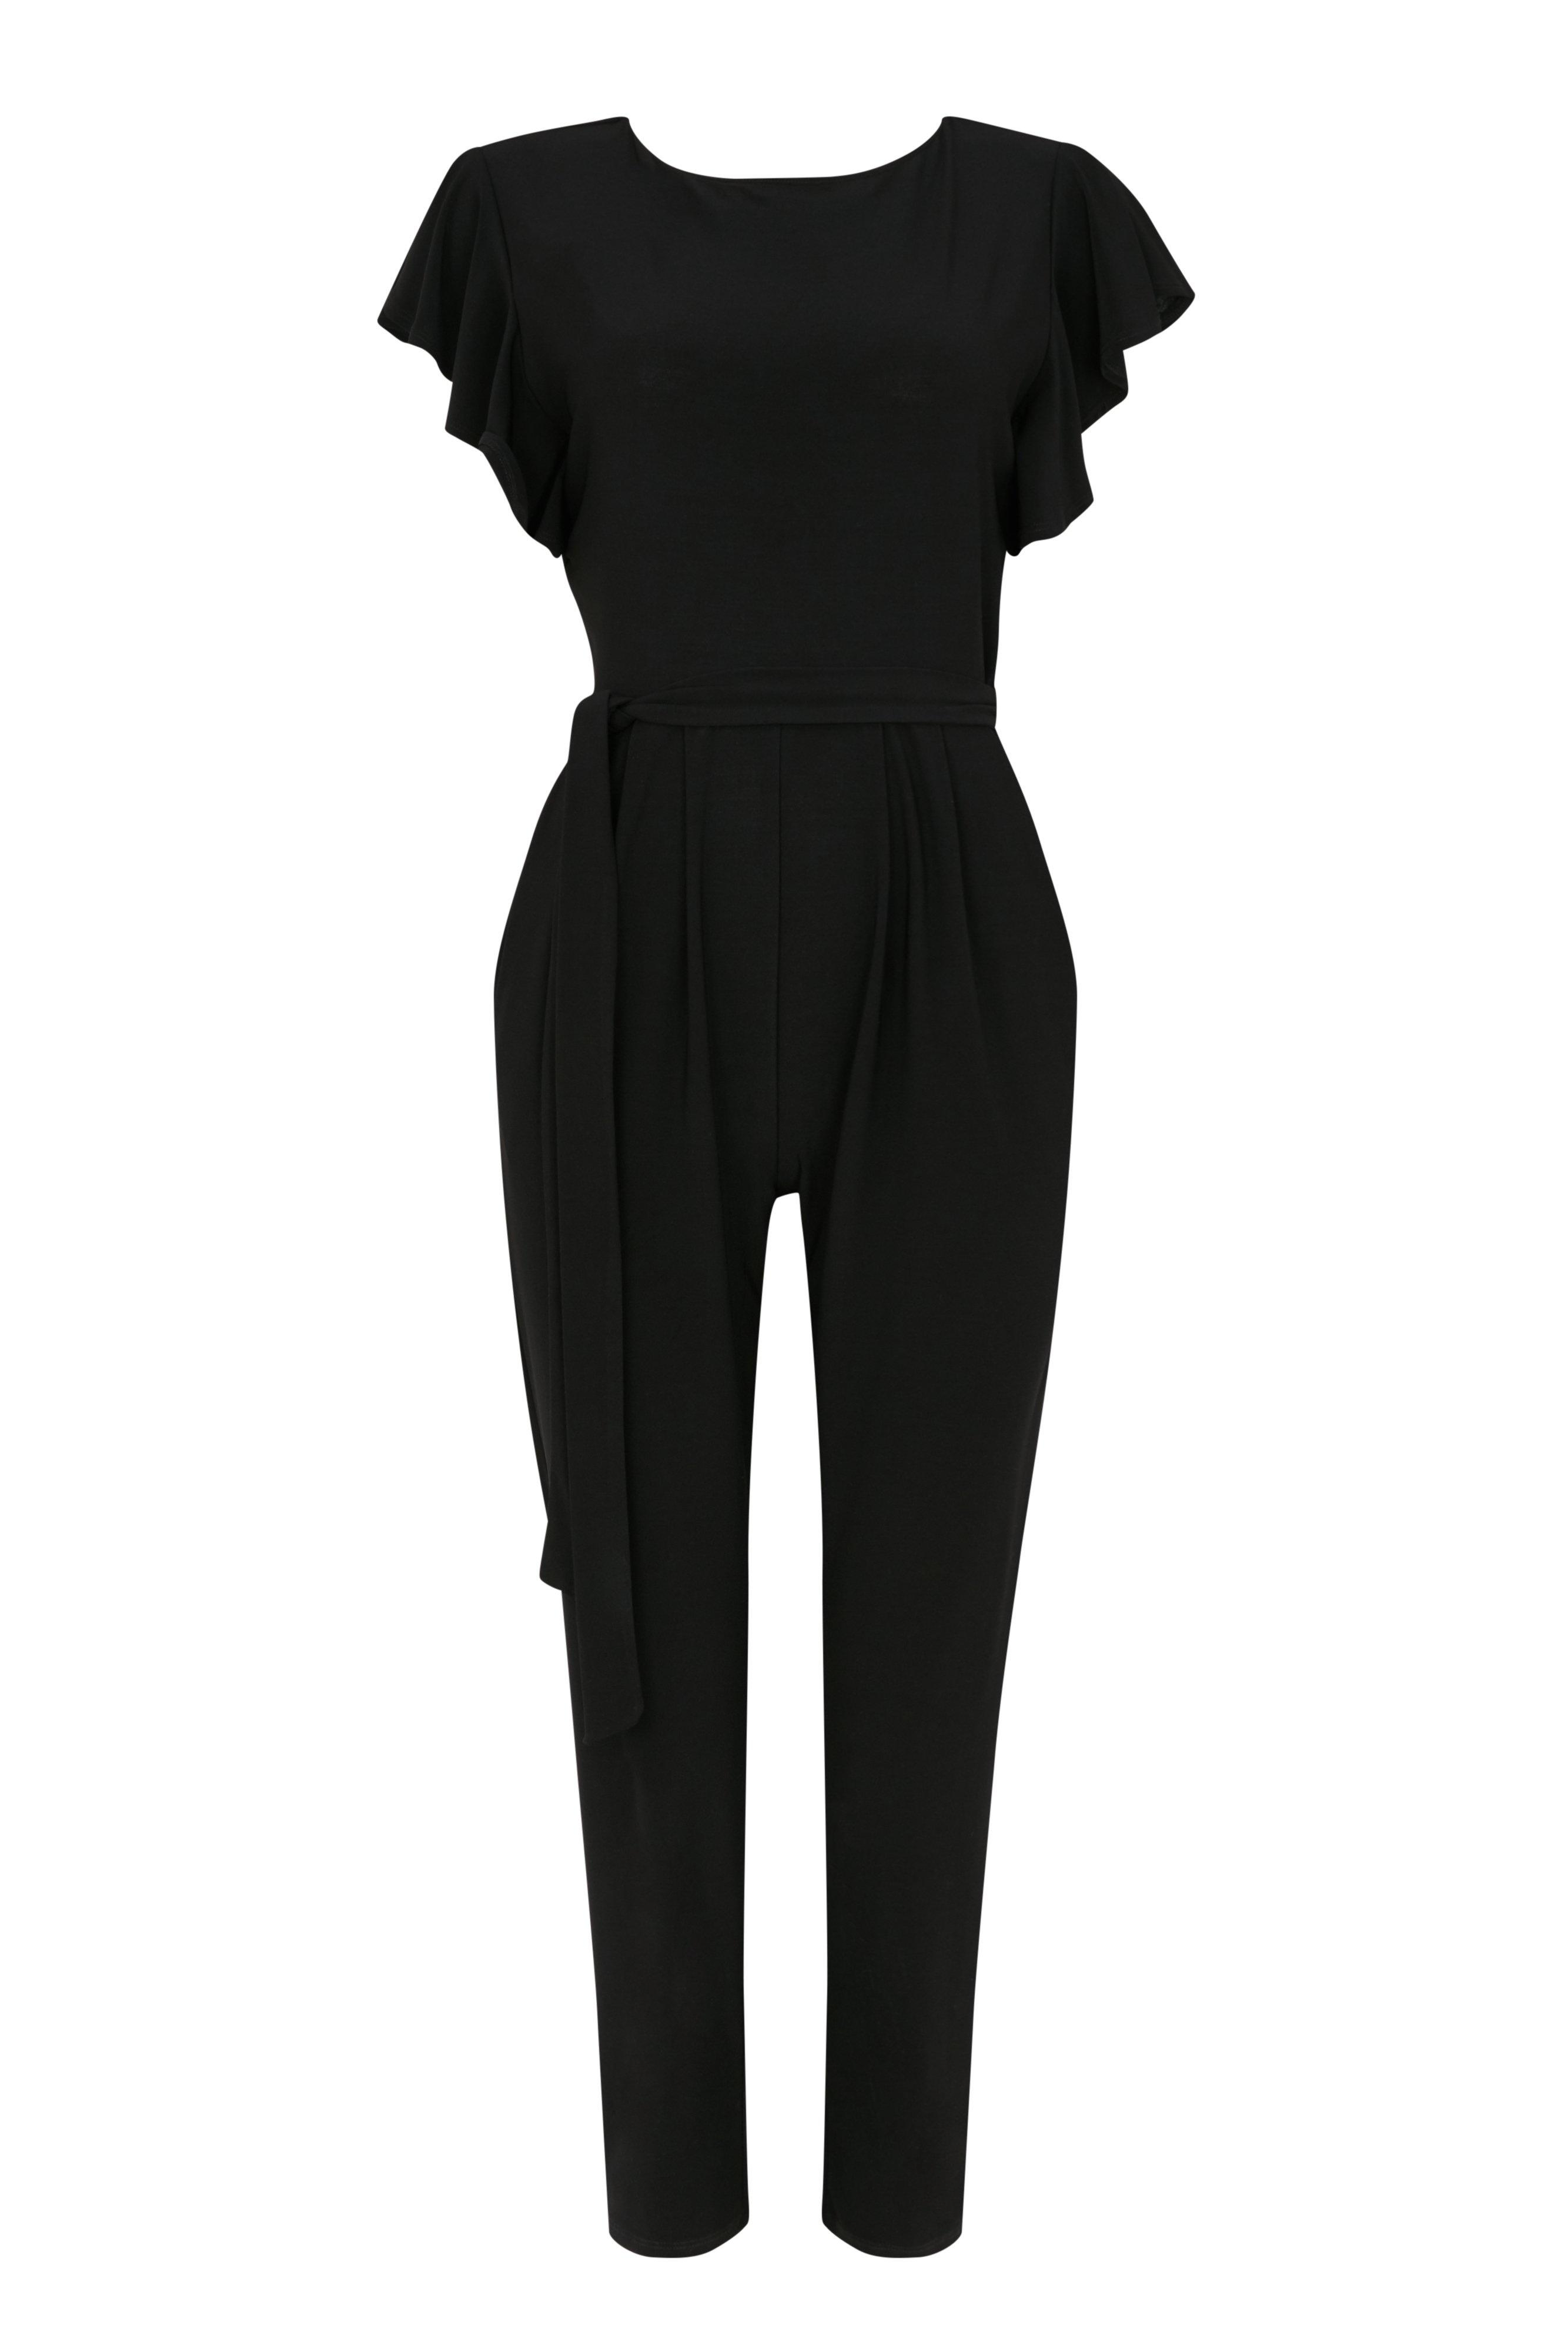 4033f96c7a Wallis - Petite Black Frill Belted Jumpsuit - Lyst. View fullscreen